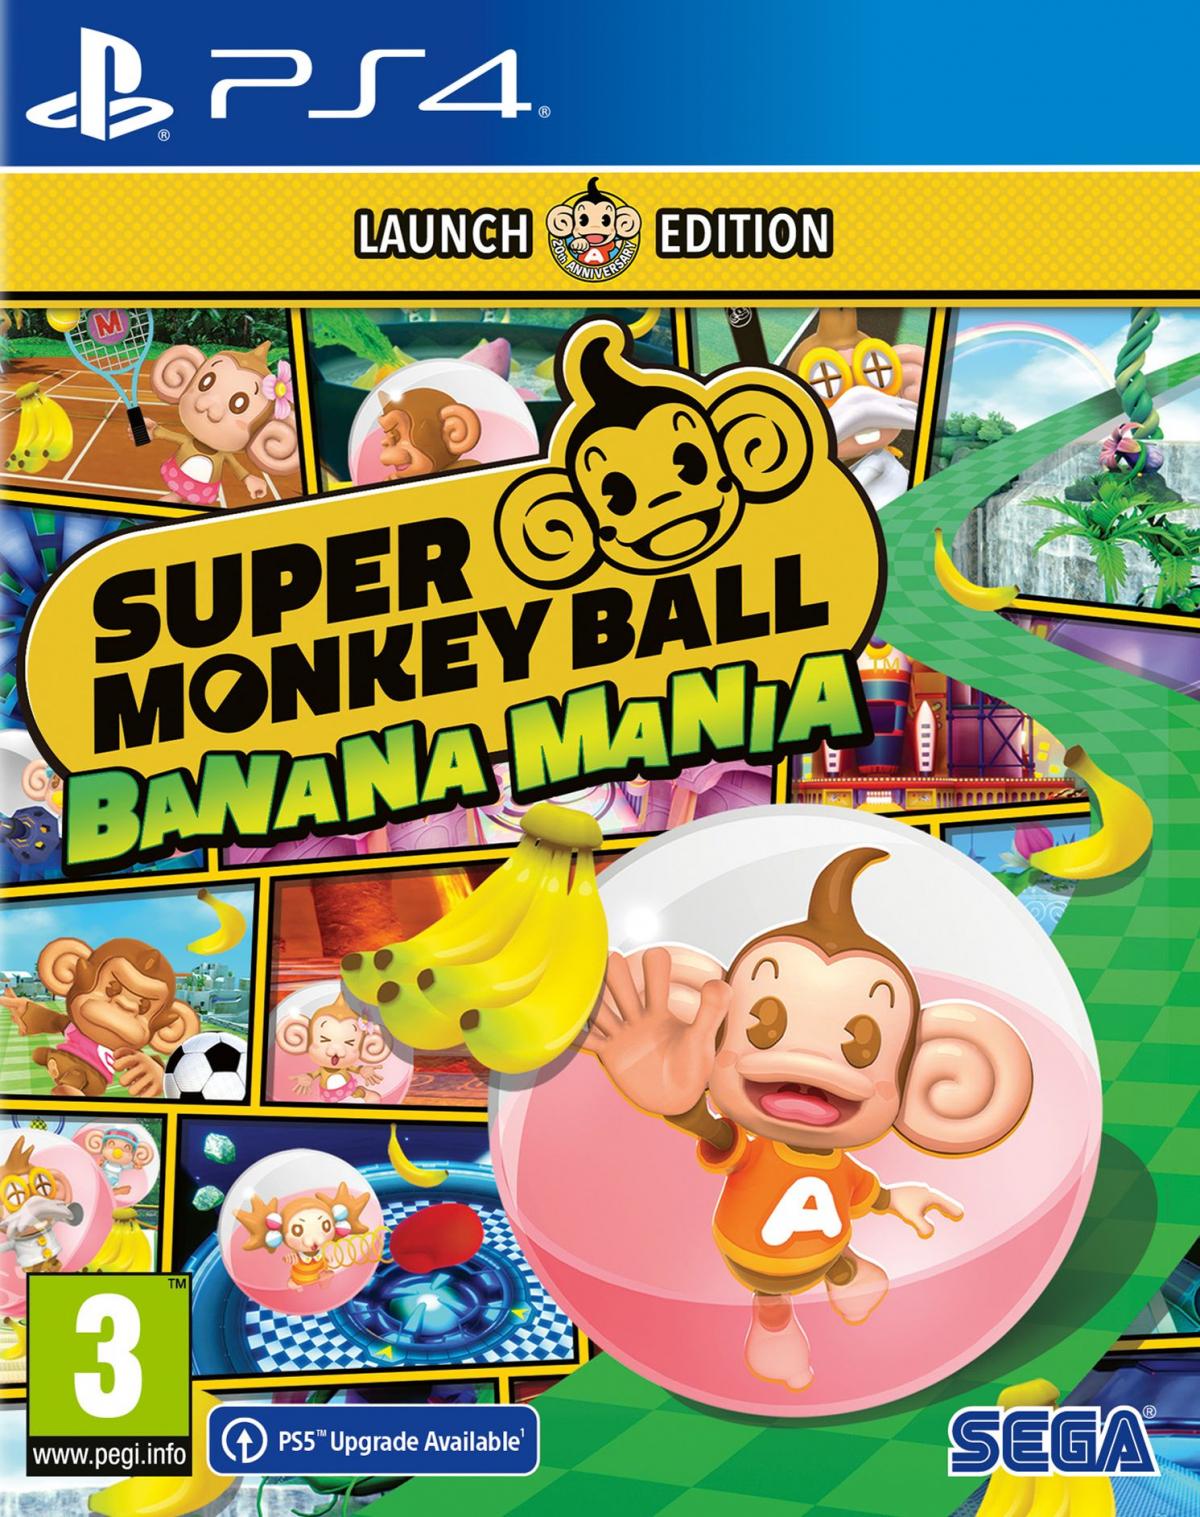 PS4 Super Monkey Ball Banana Mania Launch Edition